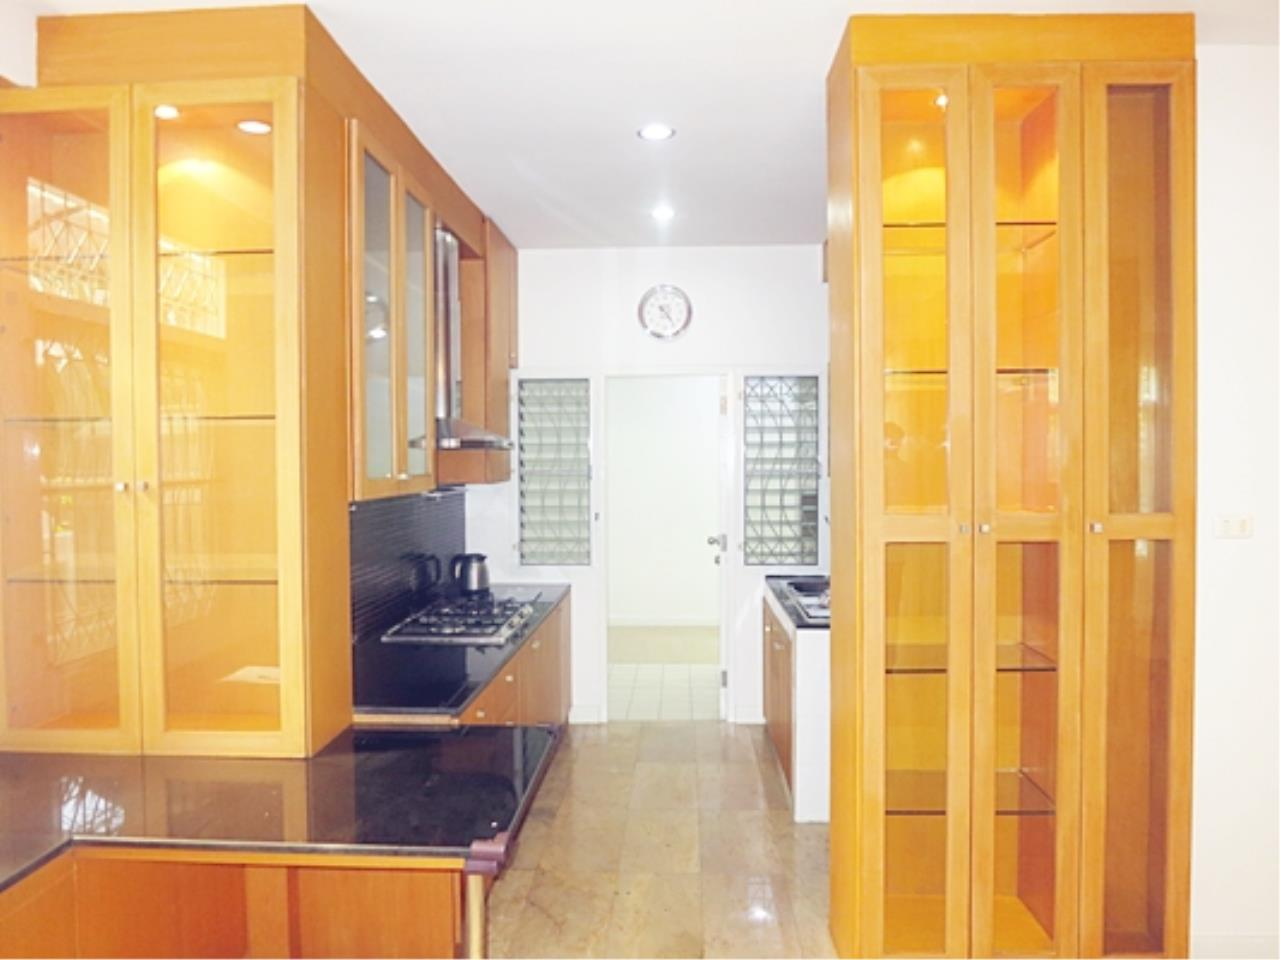 Estate Corner Agency (Samut Prakan) Agency's Single house for sale Ladprao, fully furnished. 7